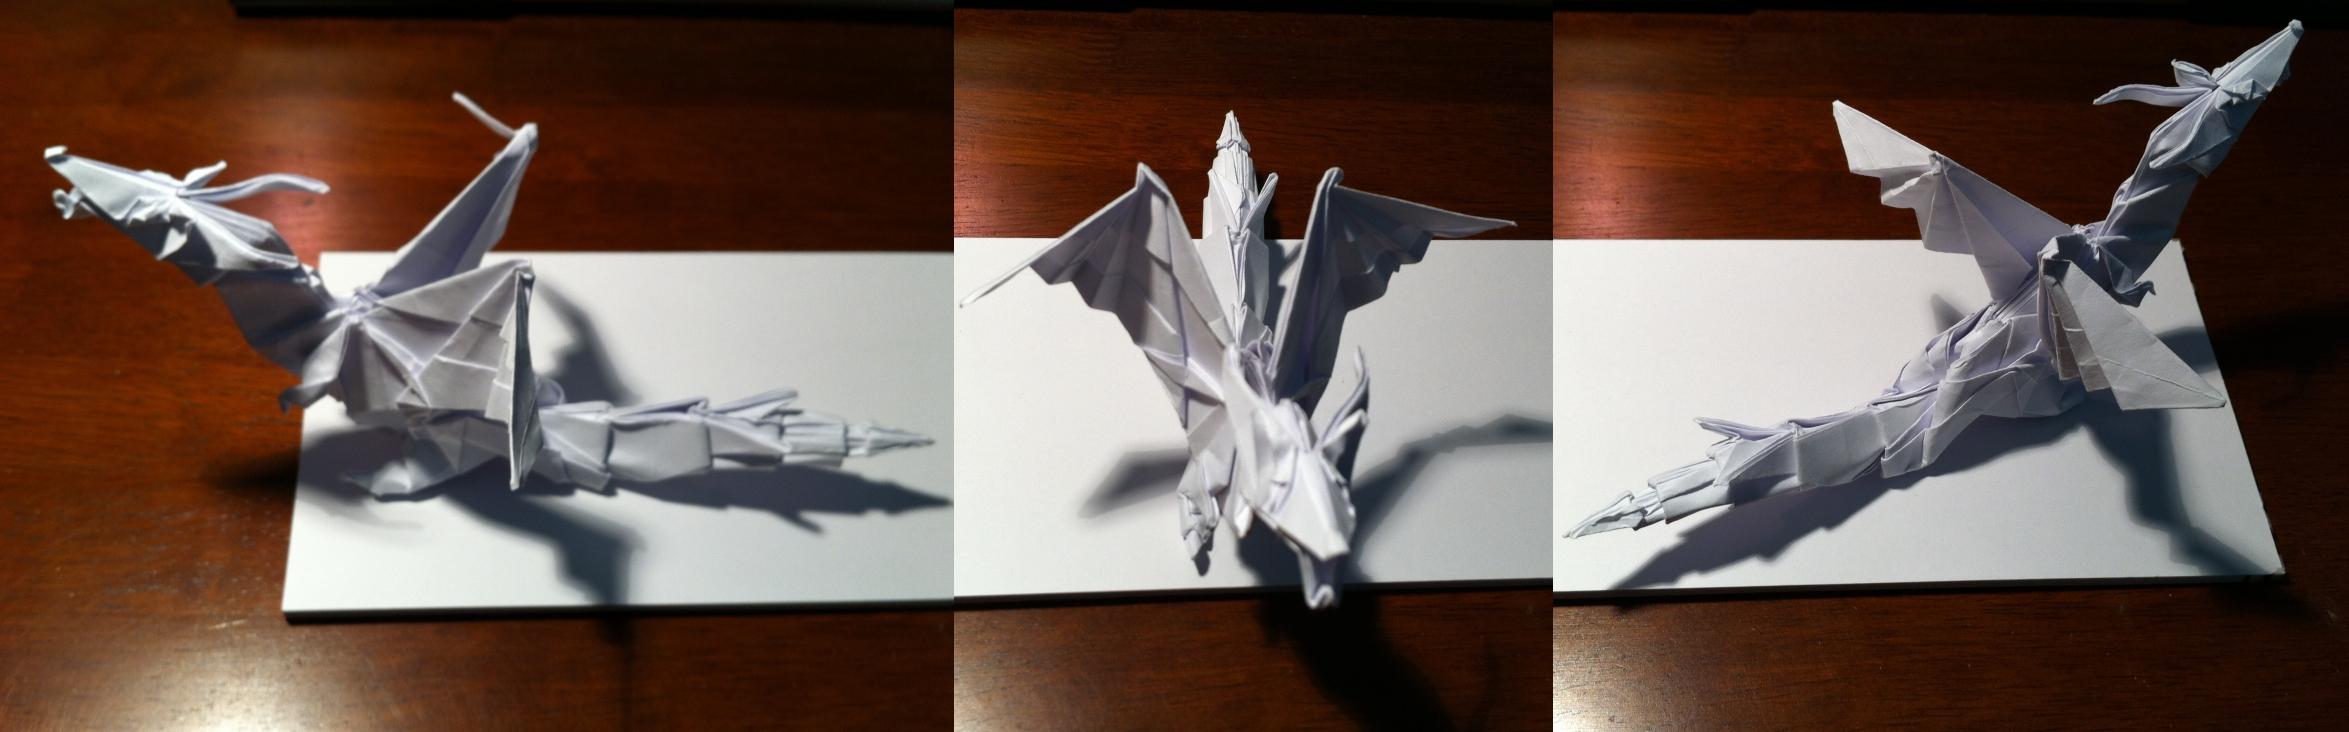 Kade Chan Origami Blog 香港摺紙工作室 (日誌): Fiery Dragon ... | 732x2349